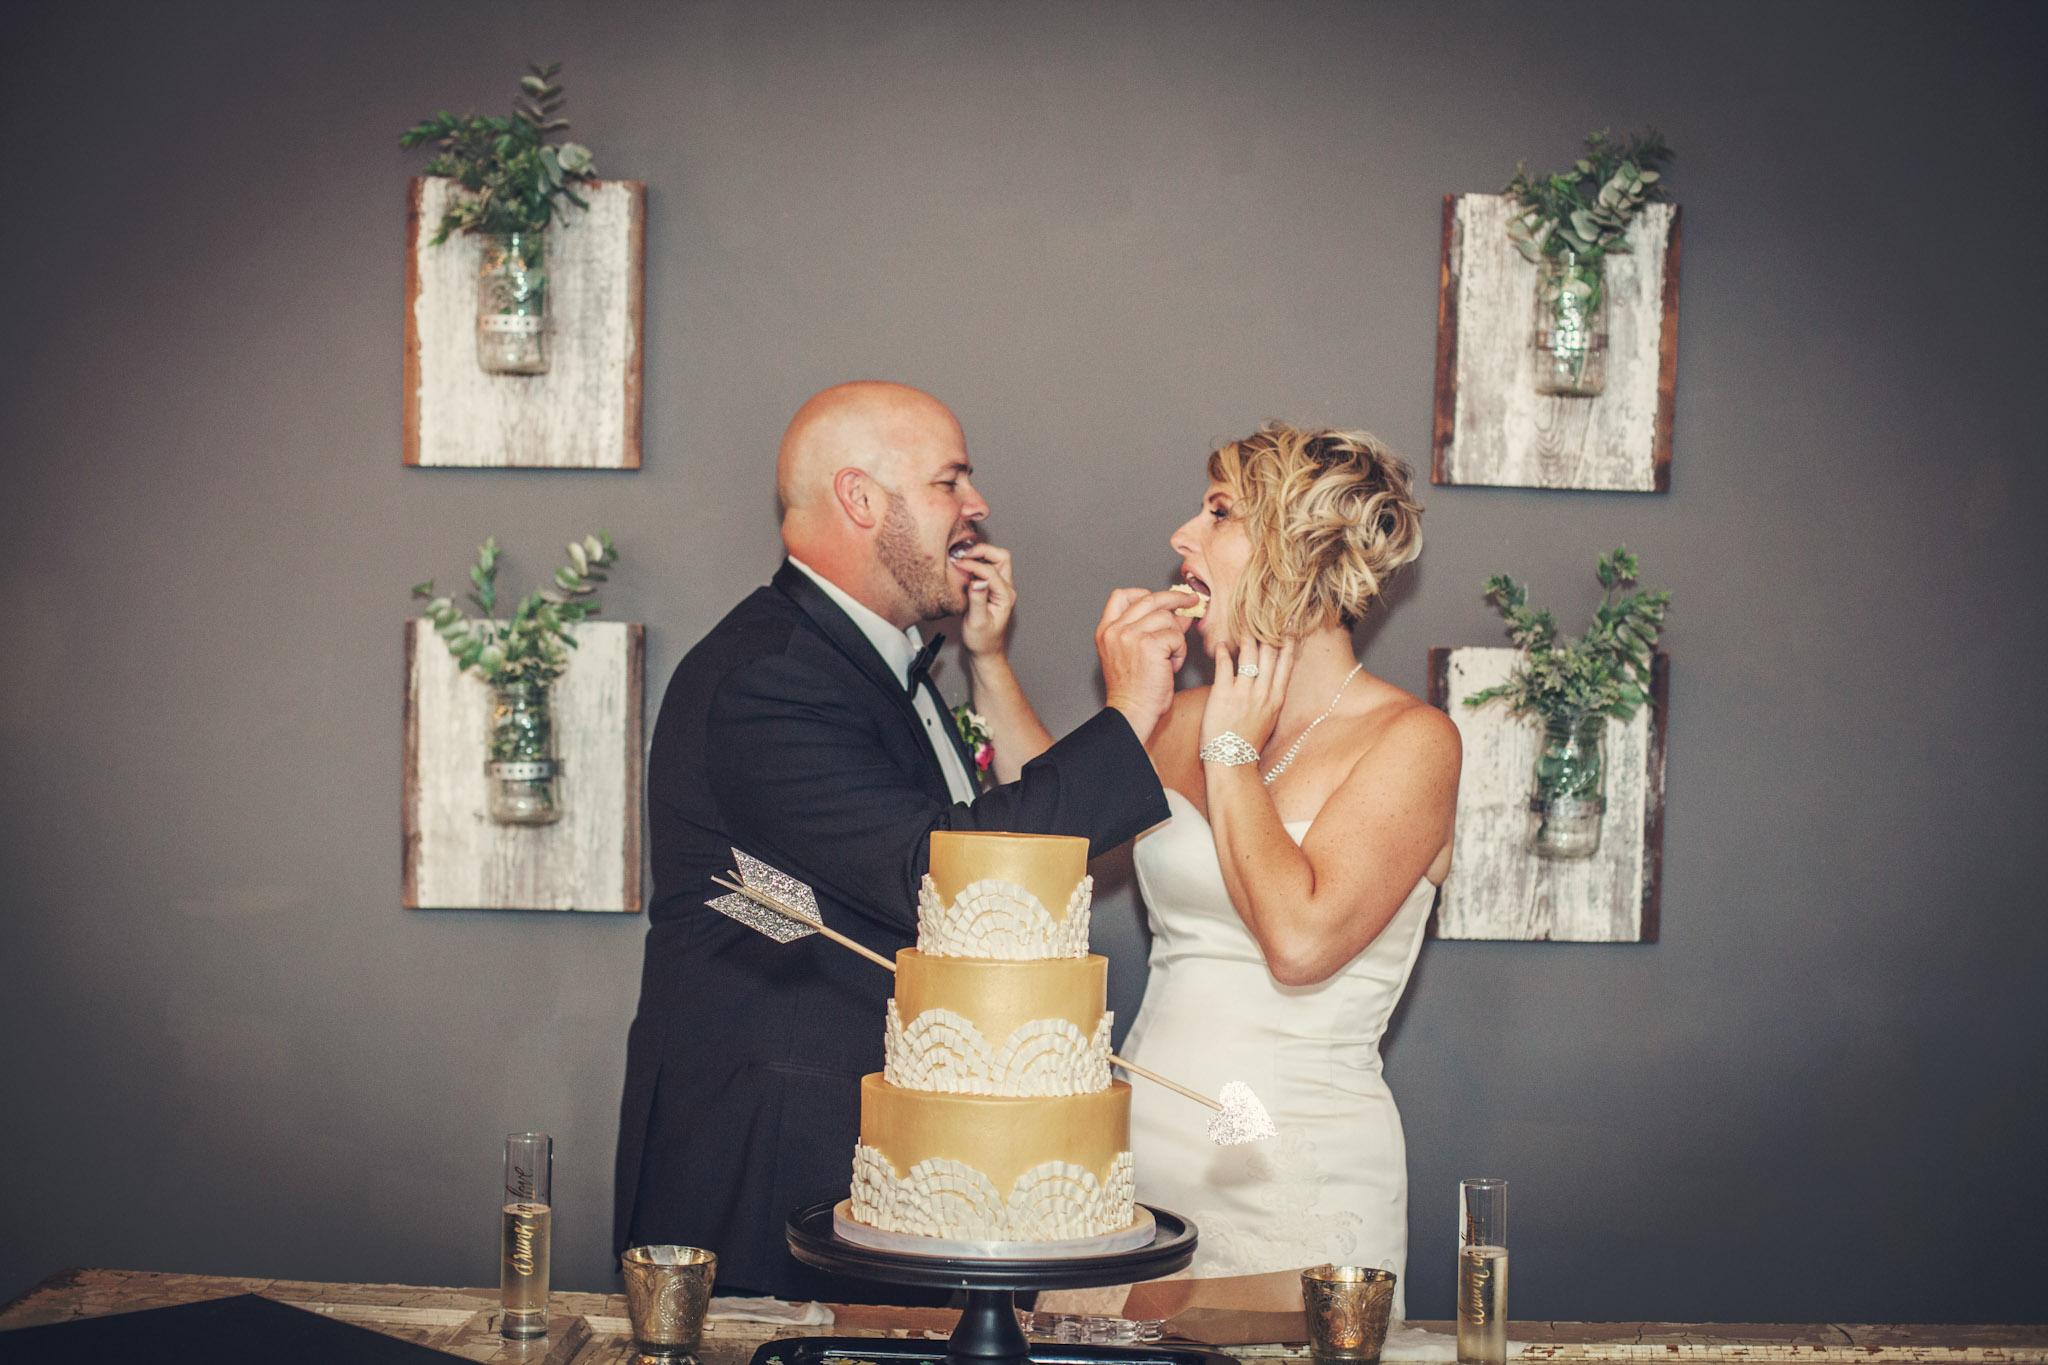 Kansas_City_Small_Intimate_Budget_Wedding_Venue_Melanie&David_248b.jpg